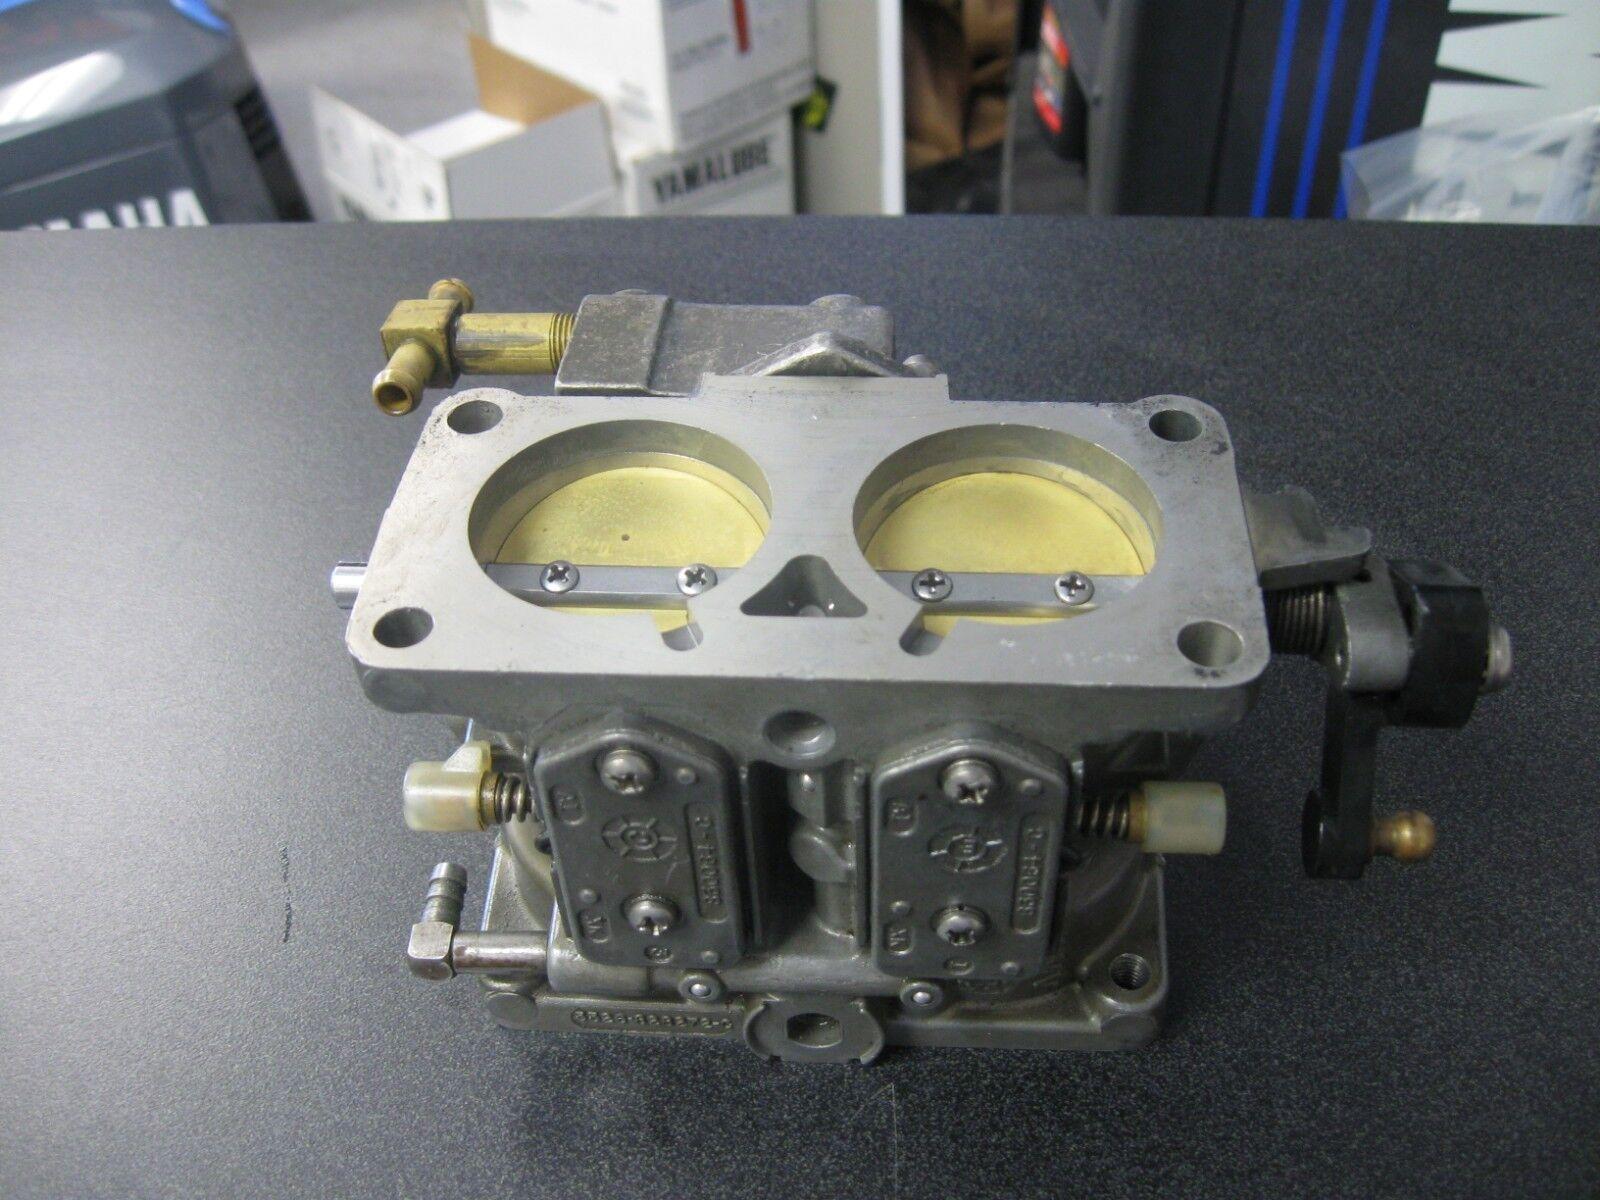 Mercury 828272A40 Außenborder Vergaser Assy 828272A40 Mercury 1b640d